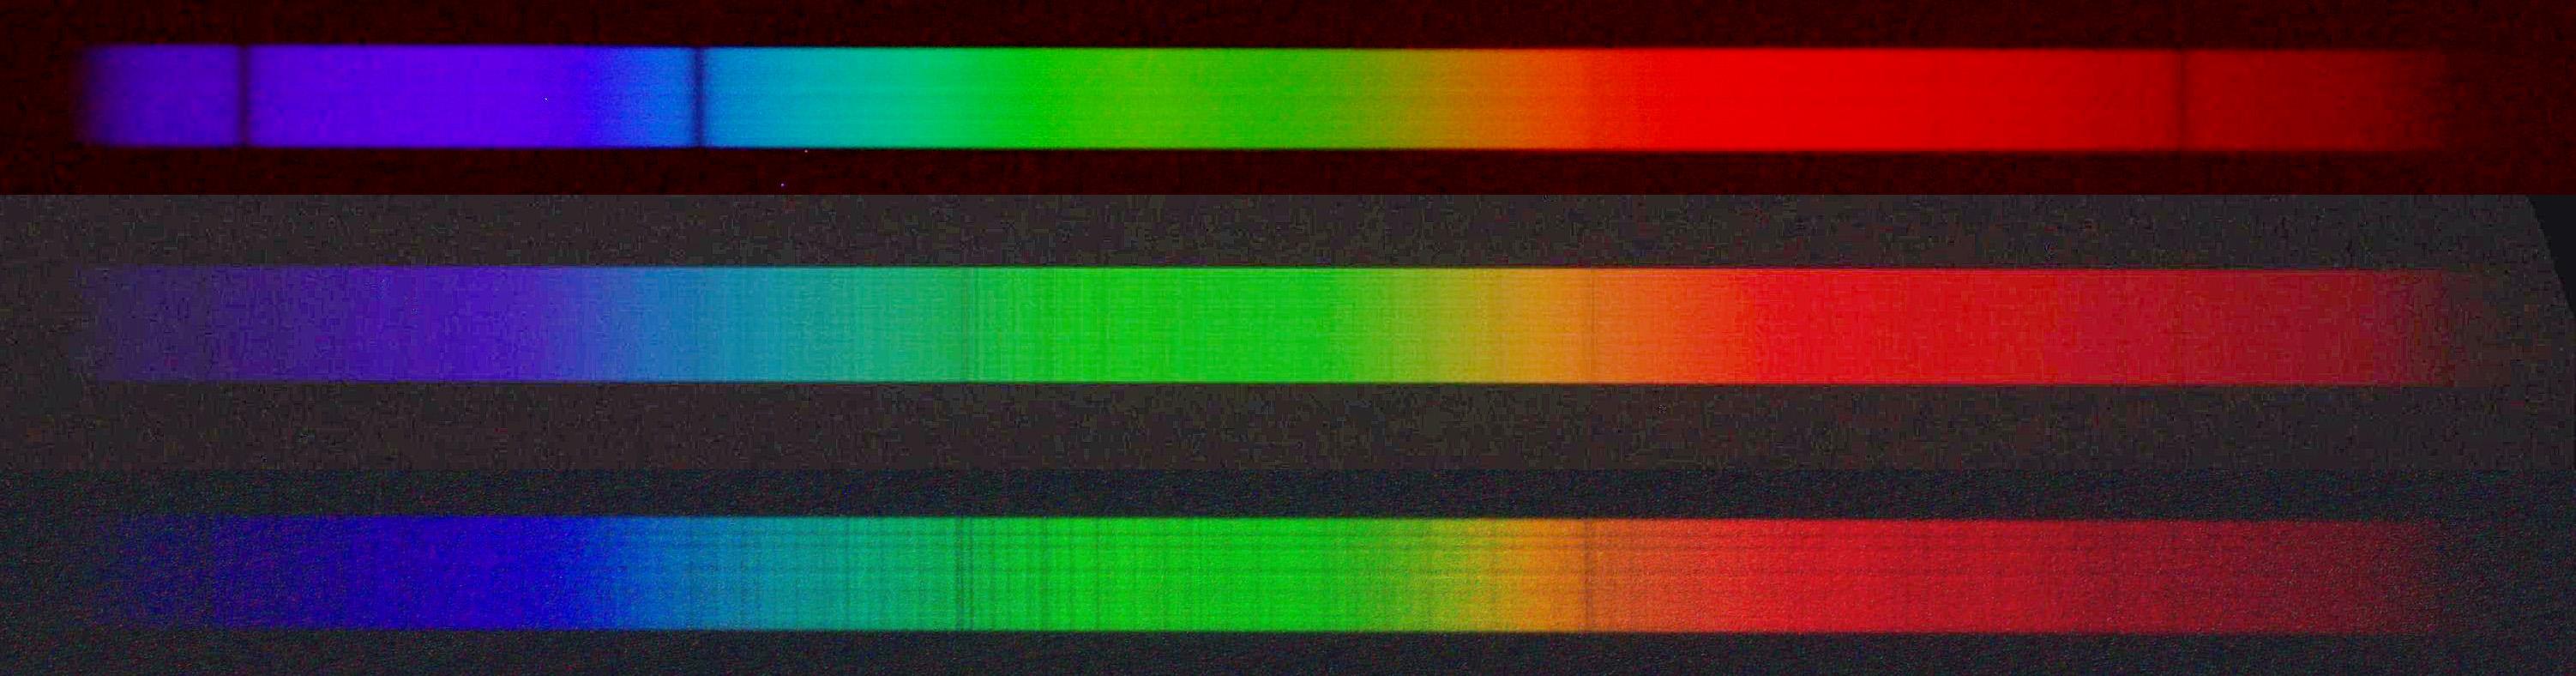 Spectreshrbis